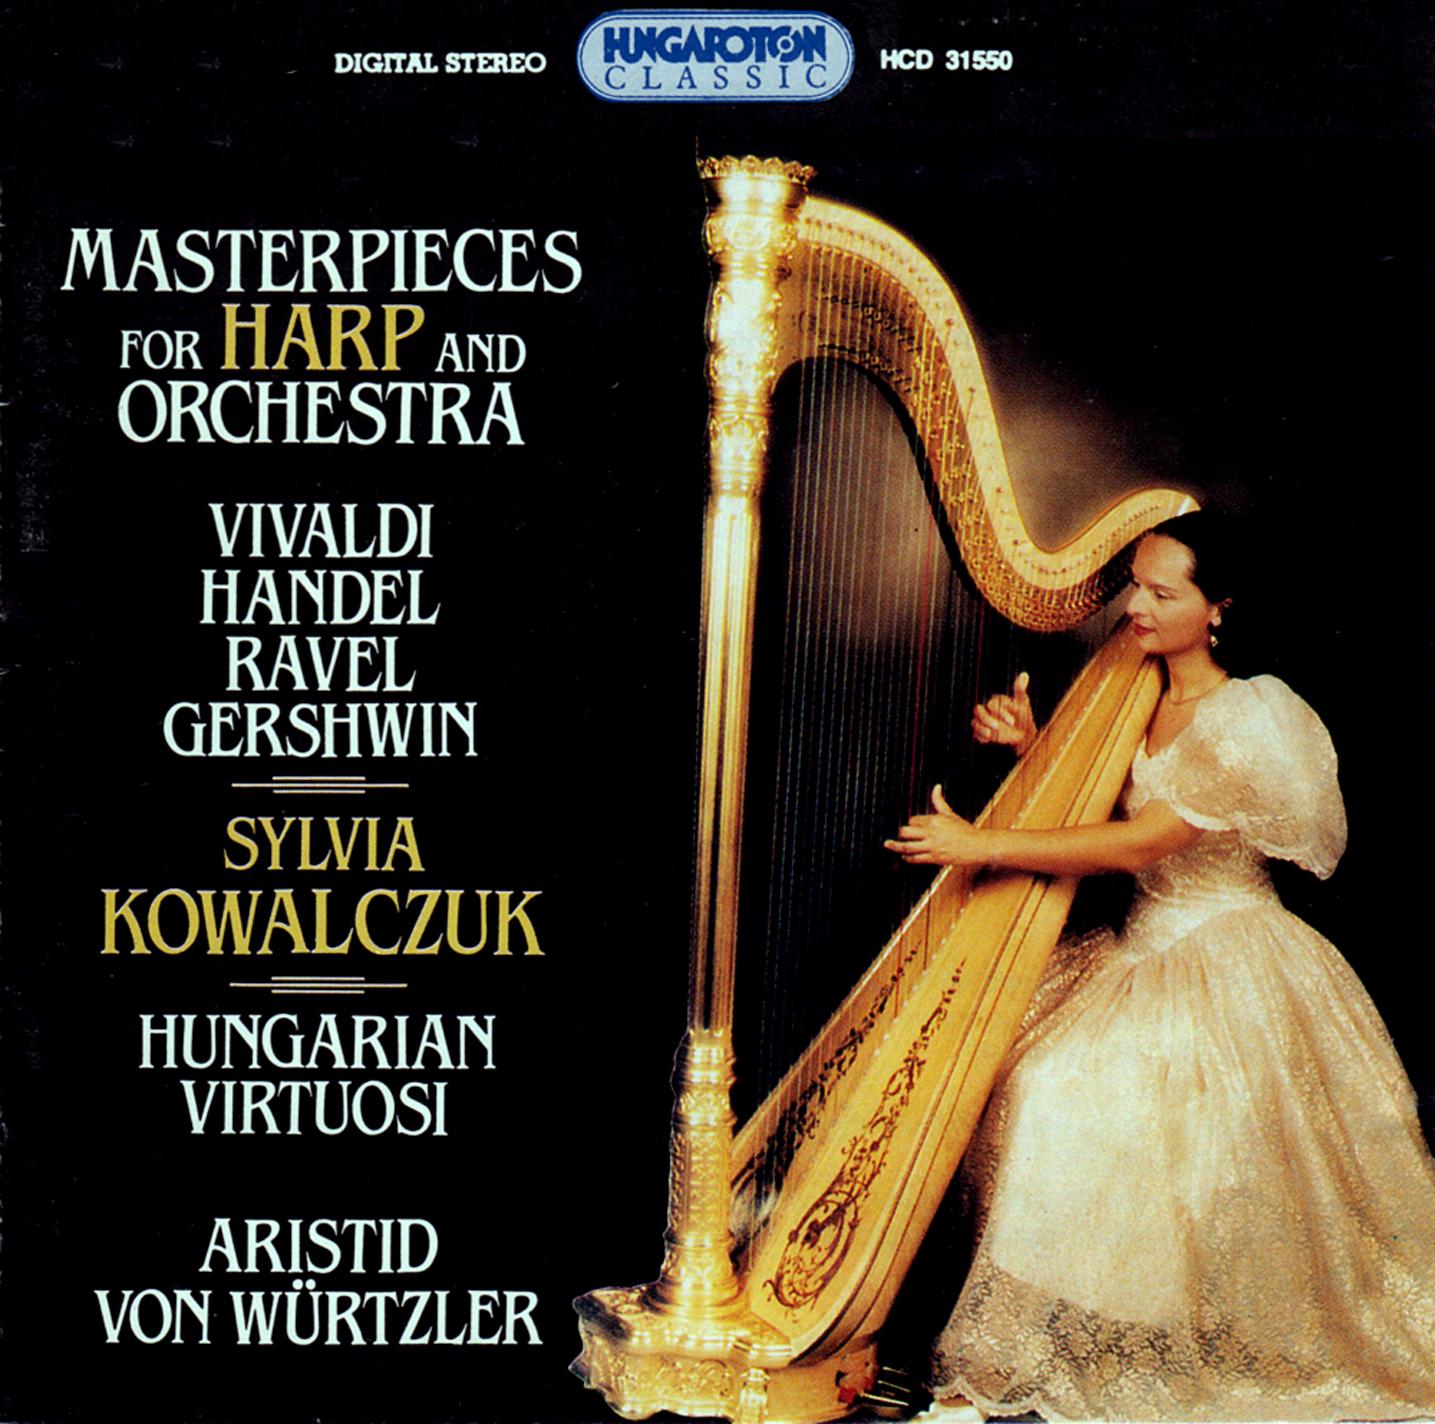 eClassical - Vivaldi: Concerto in D Major (Arr  for Harp